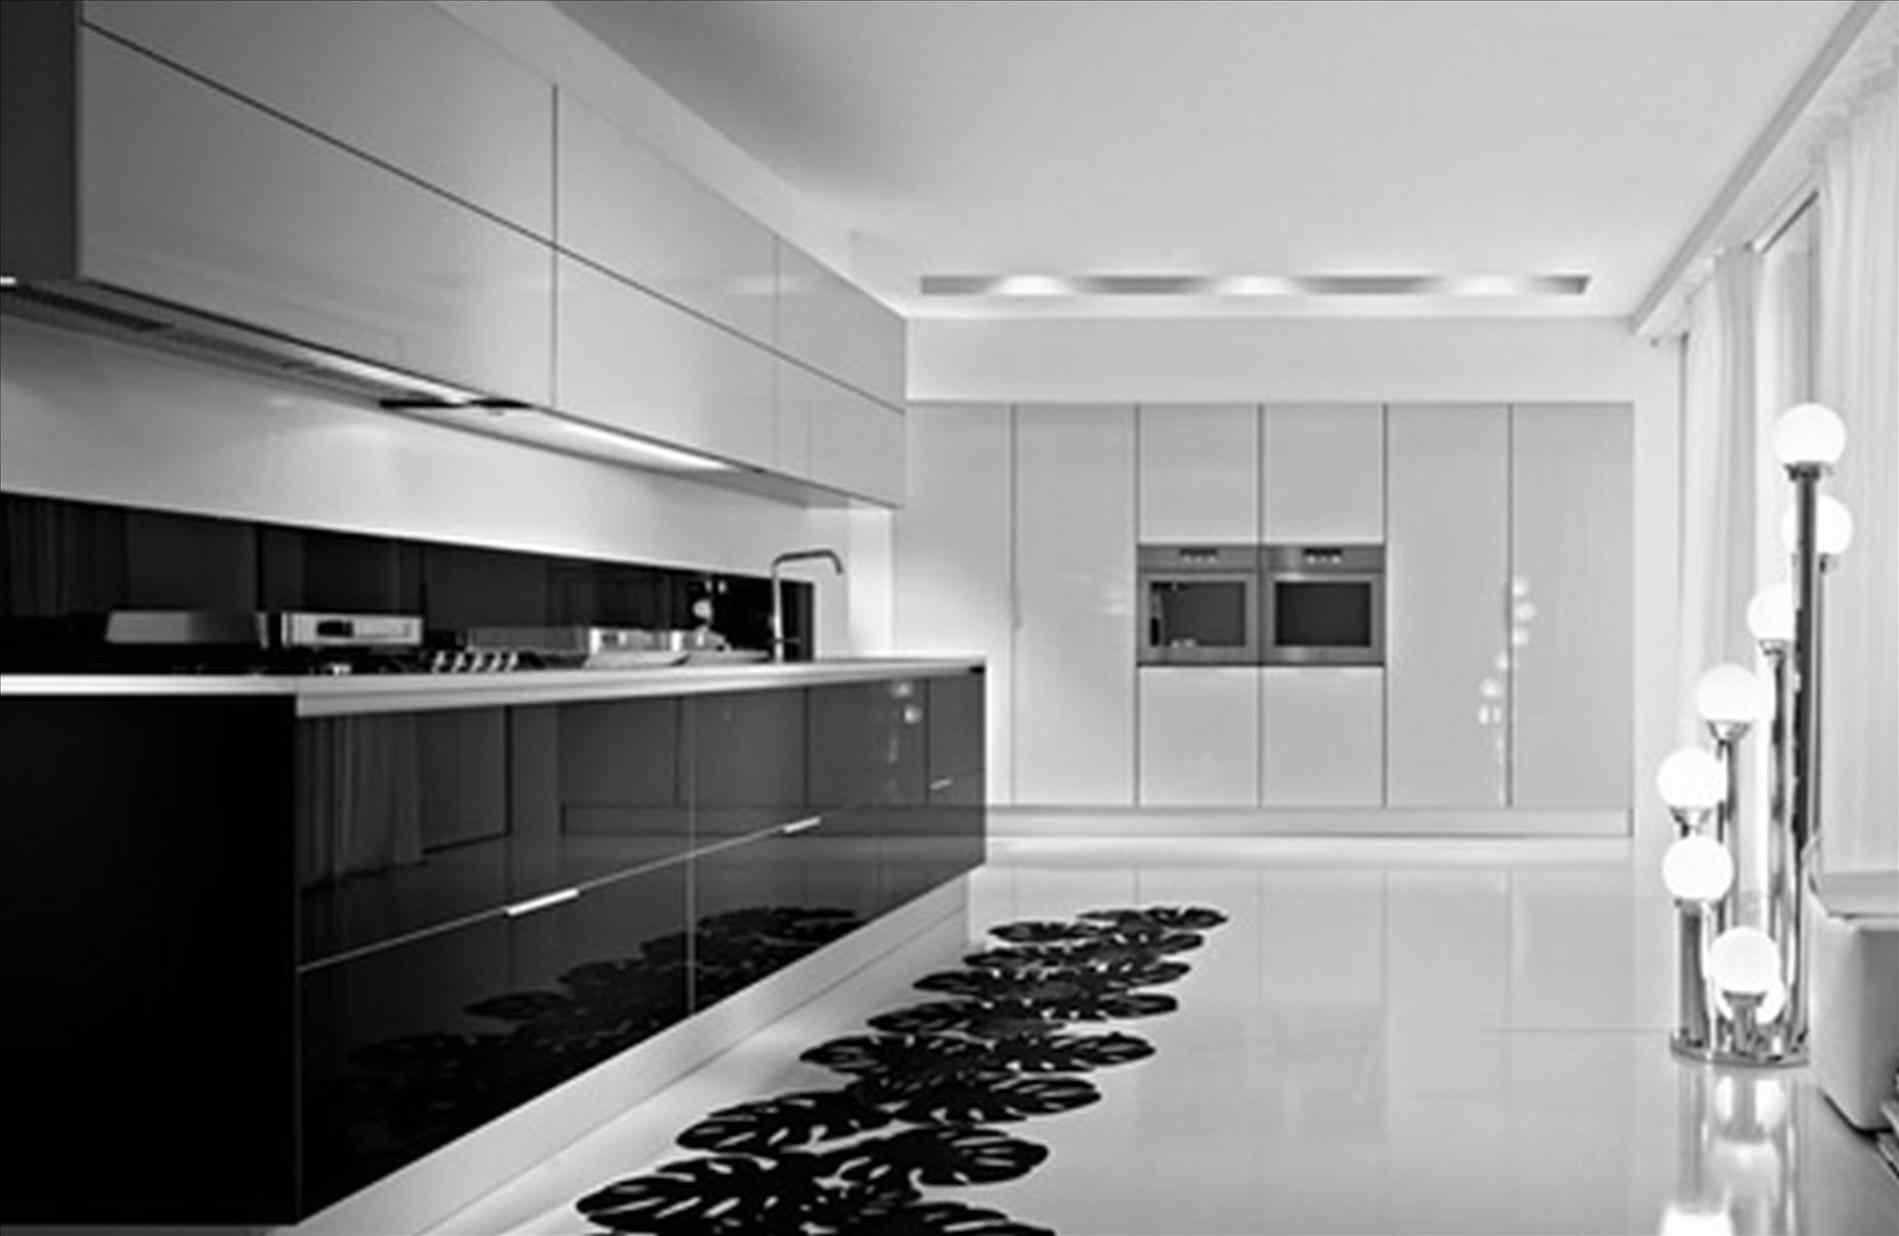 Awesome 13 Black Shiny Kitchen Cabinets Ideas For Stunning Kitchen Breakpr Modern Kitchen Furniture Kitchen Furniture Design Gloss Kitchen Cabinets